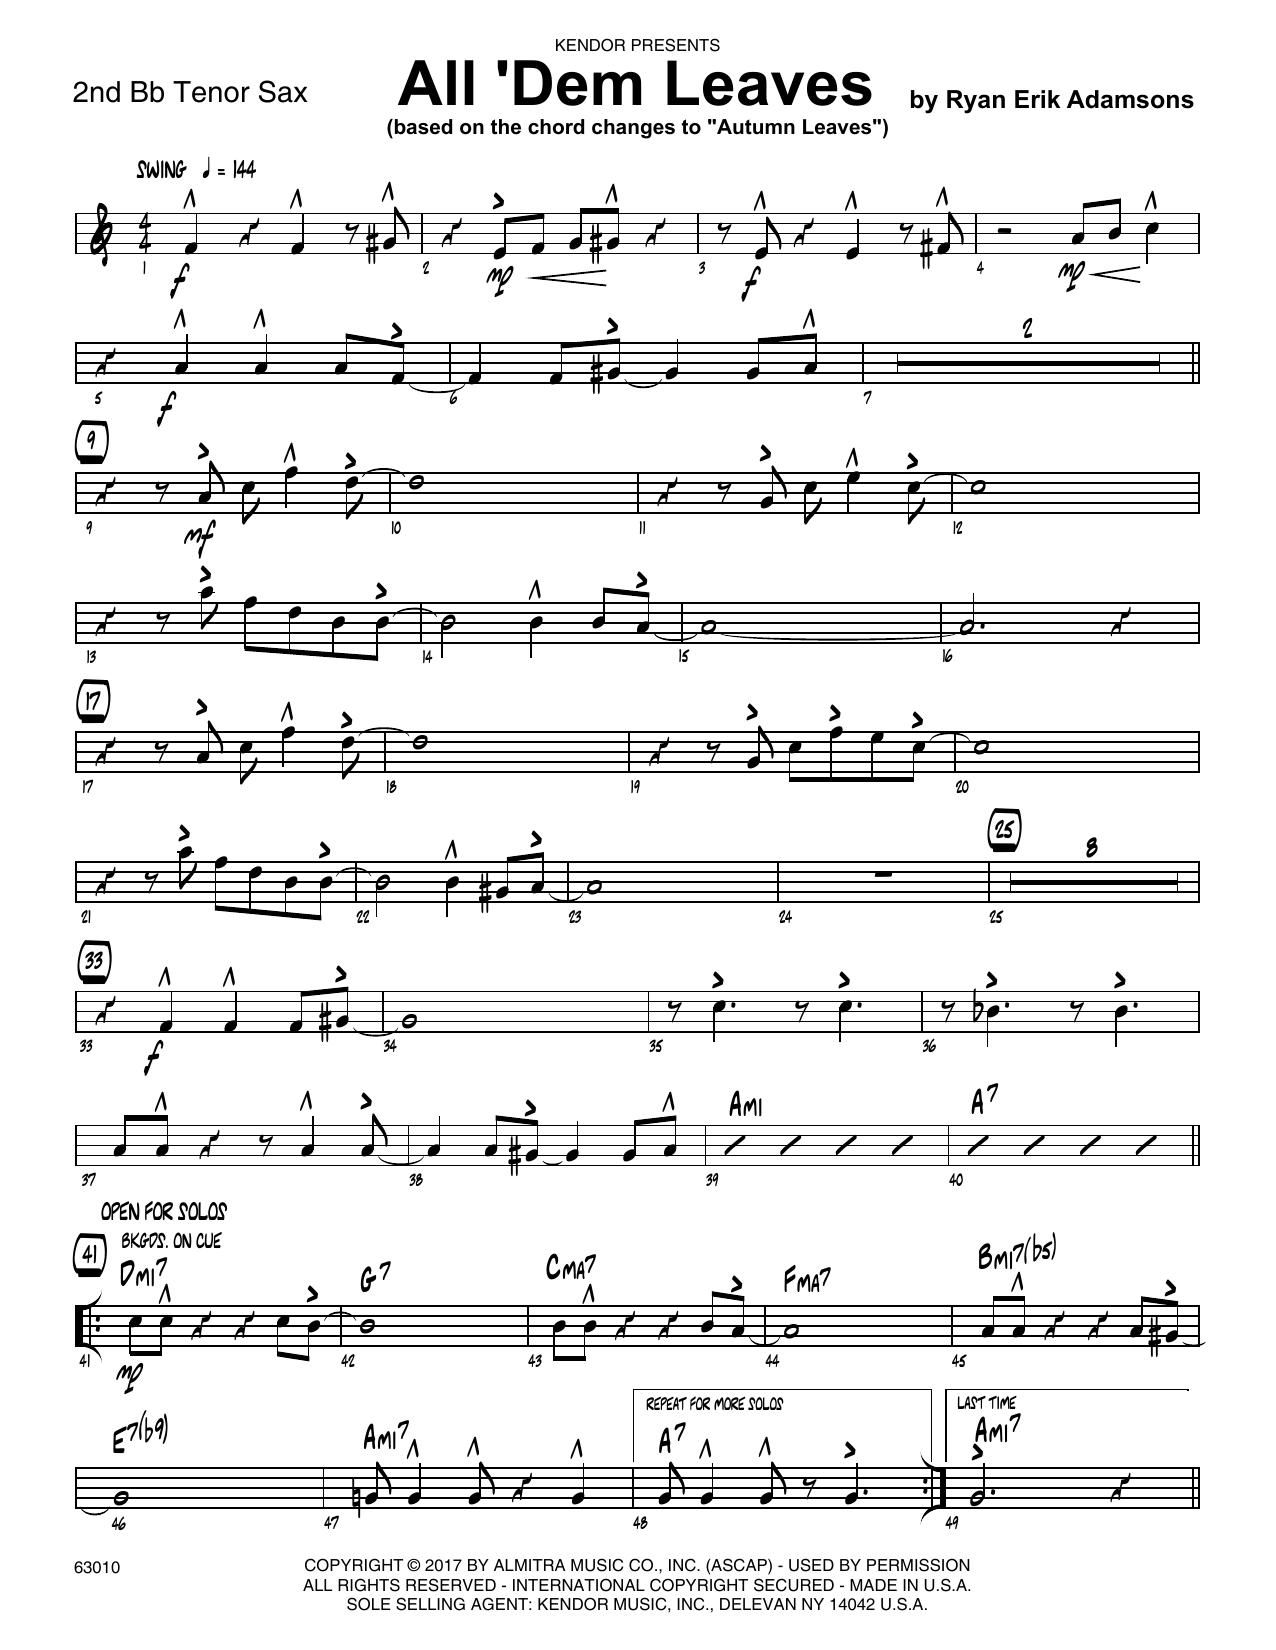 Sheet Music Digital Files To Print - Licensed Jazz Digital Sheet Music